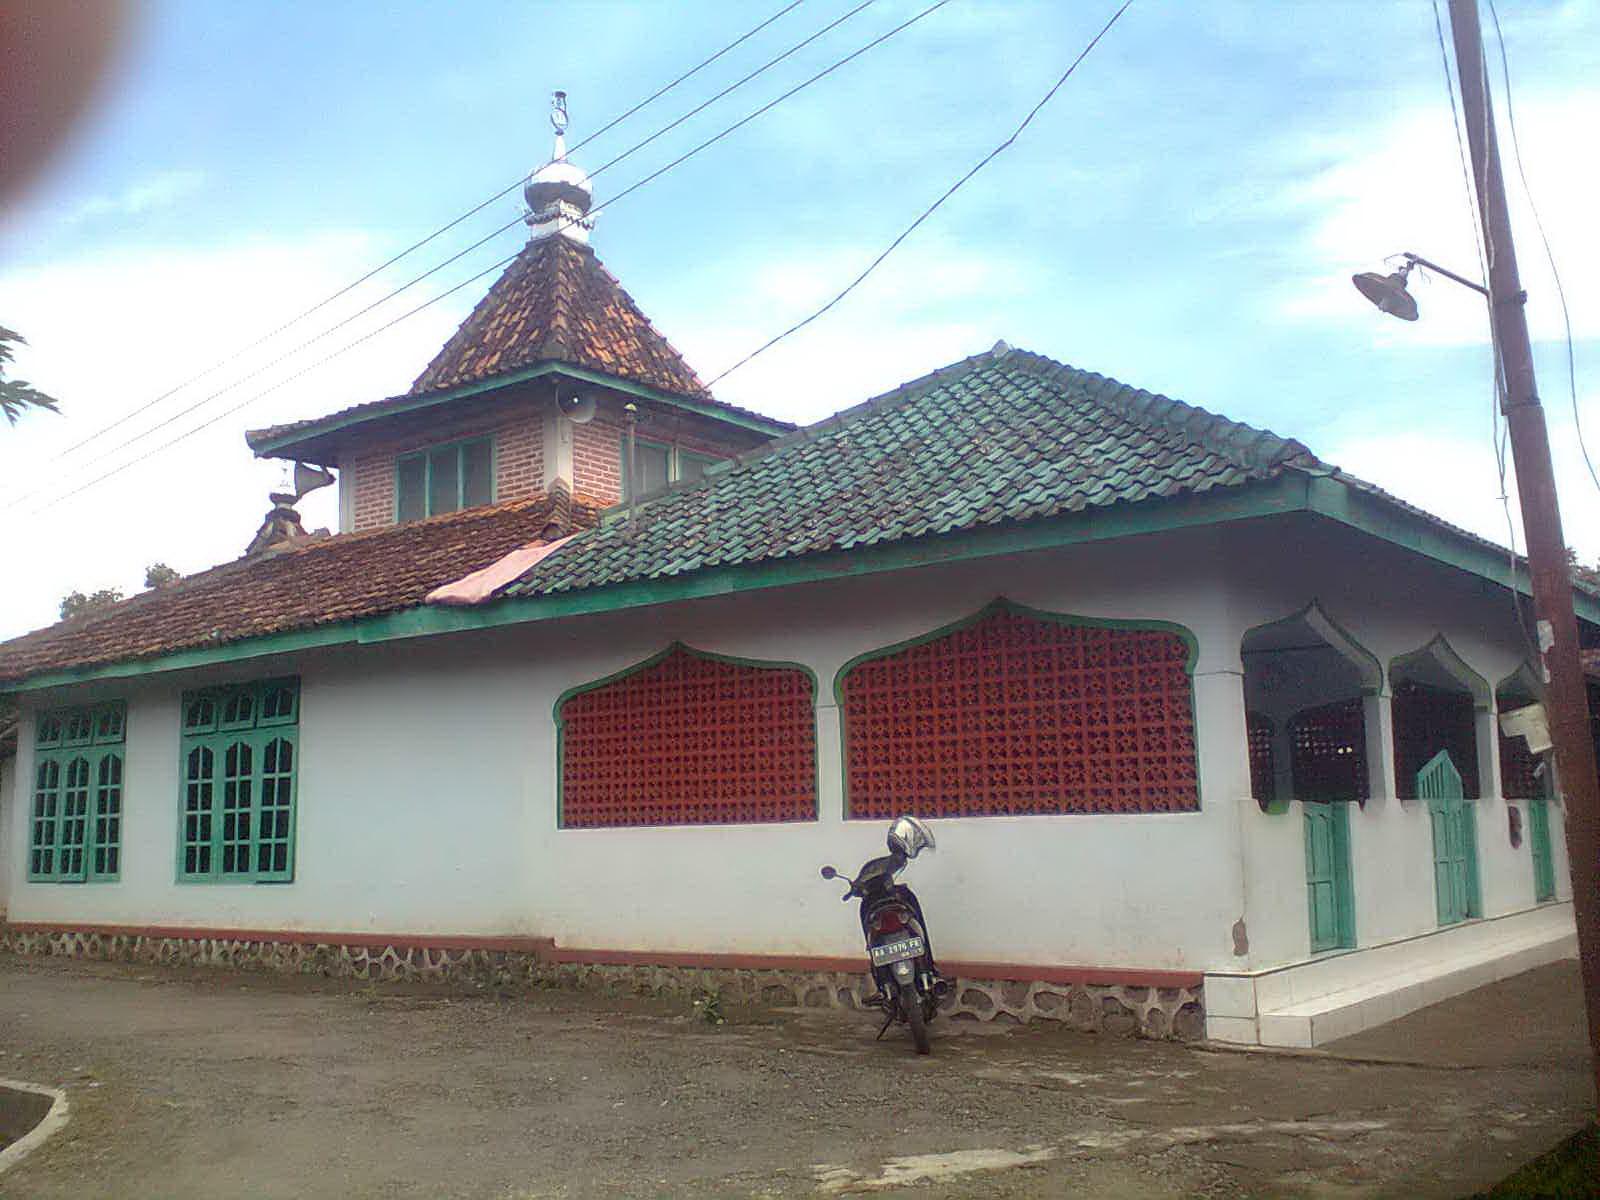 Sistem Informasi Masjid Indonesia Profil Mushalla Peta Perbesar Layar Borobudur